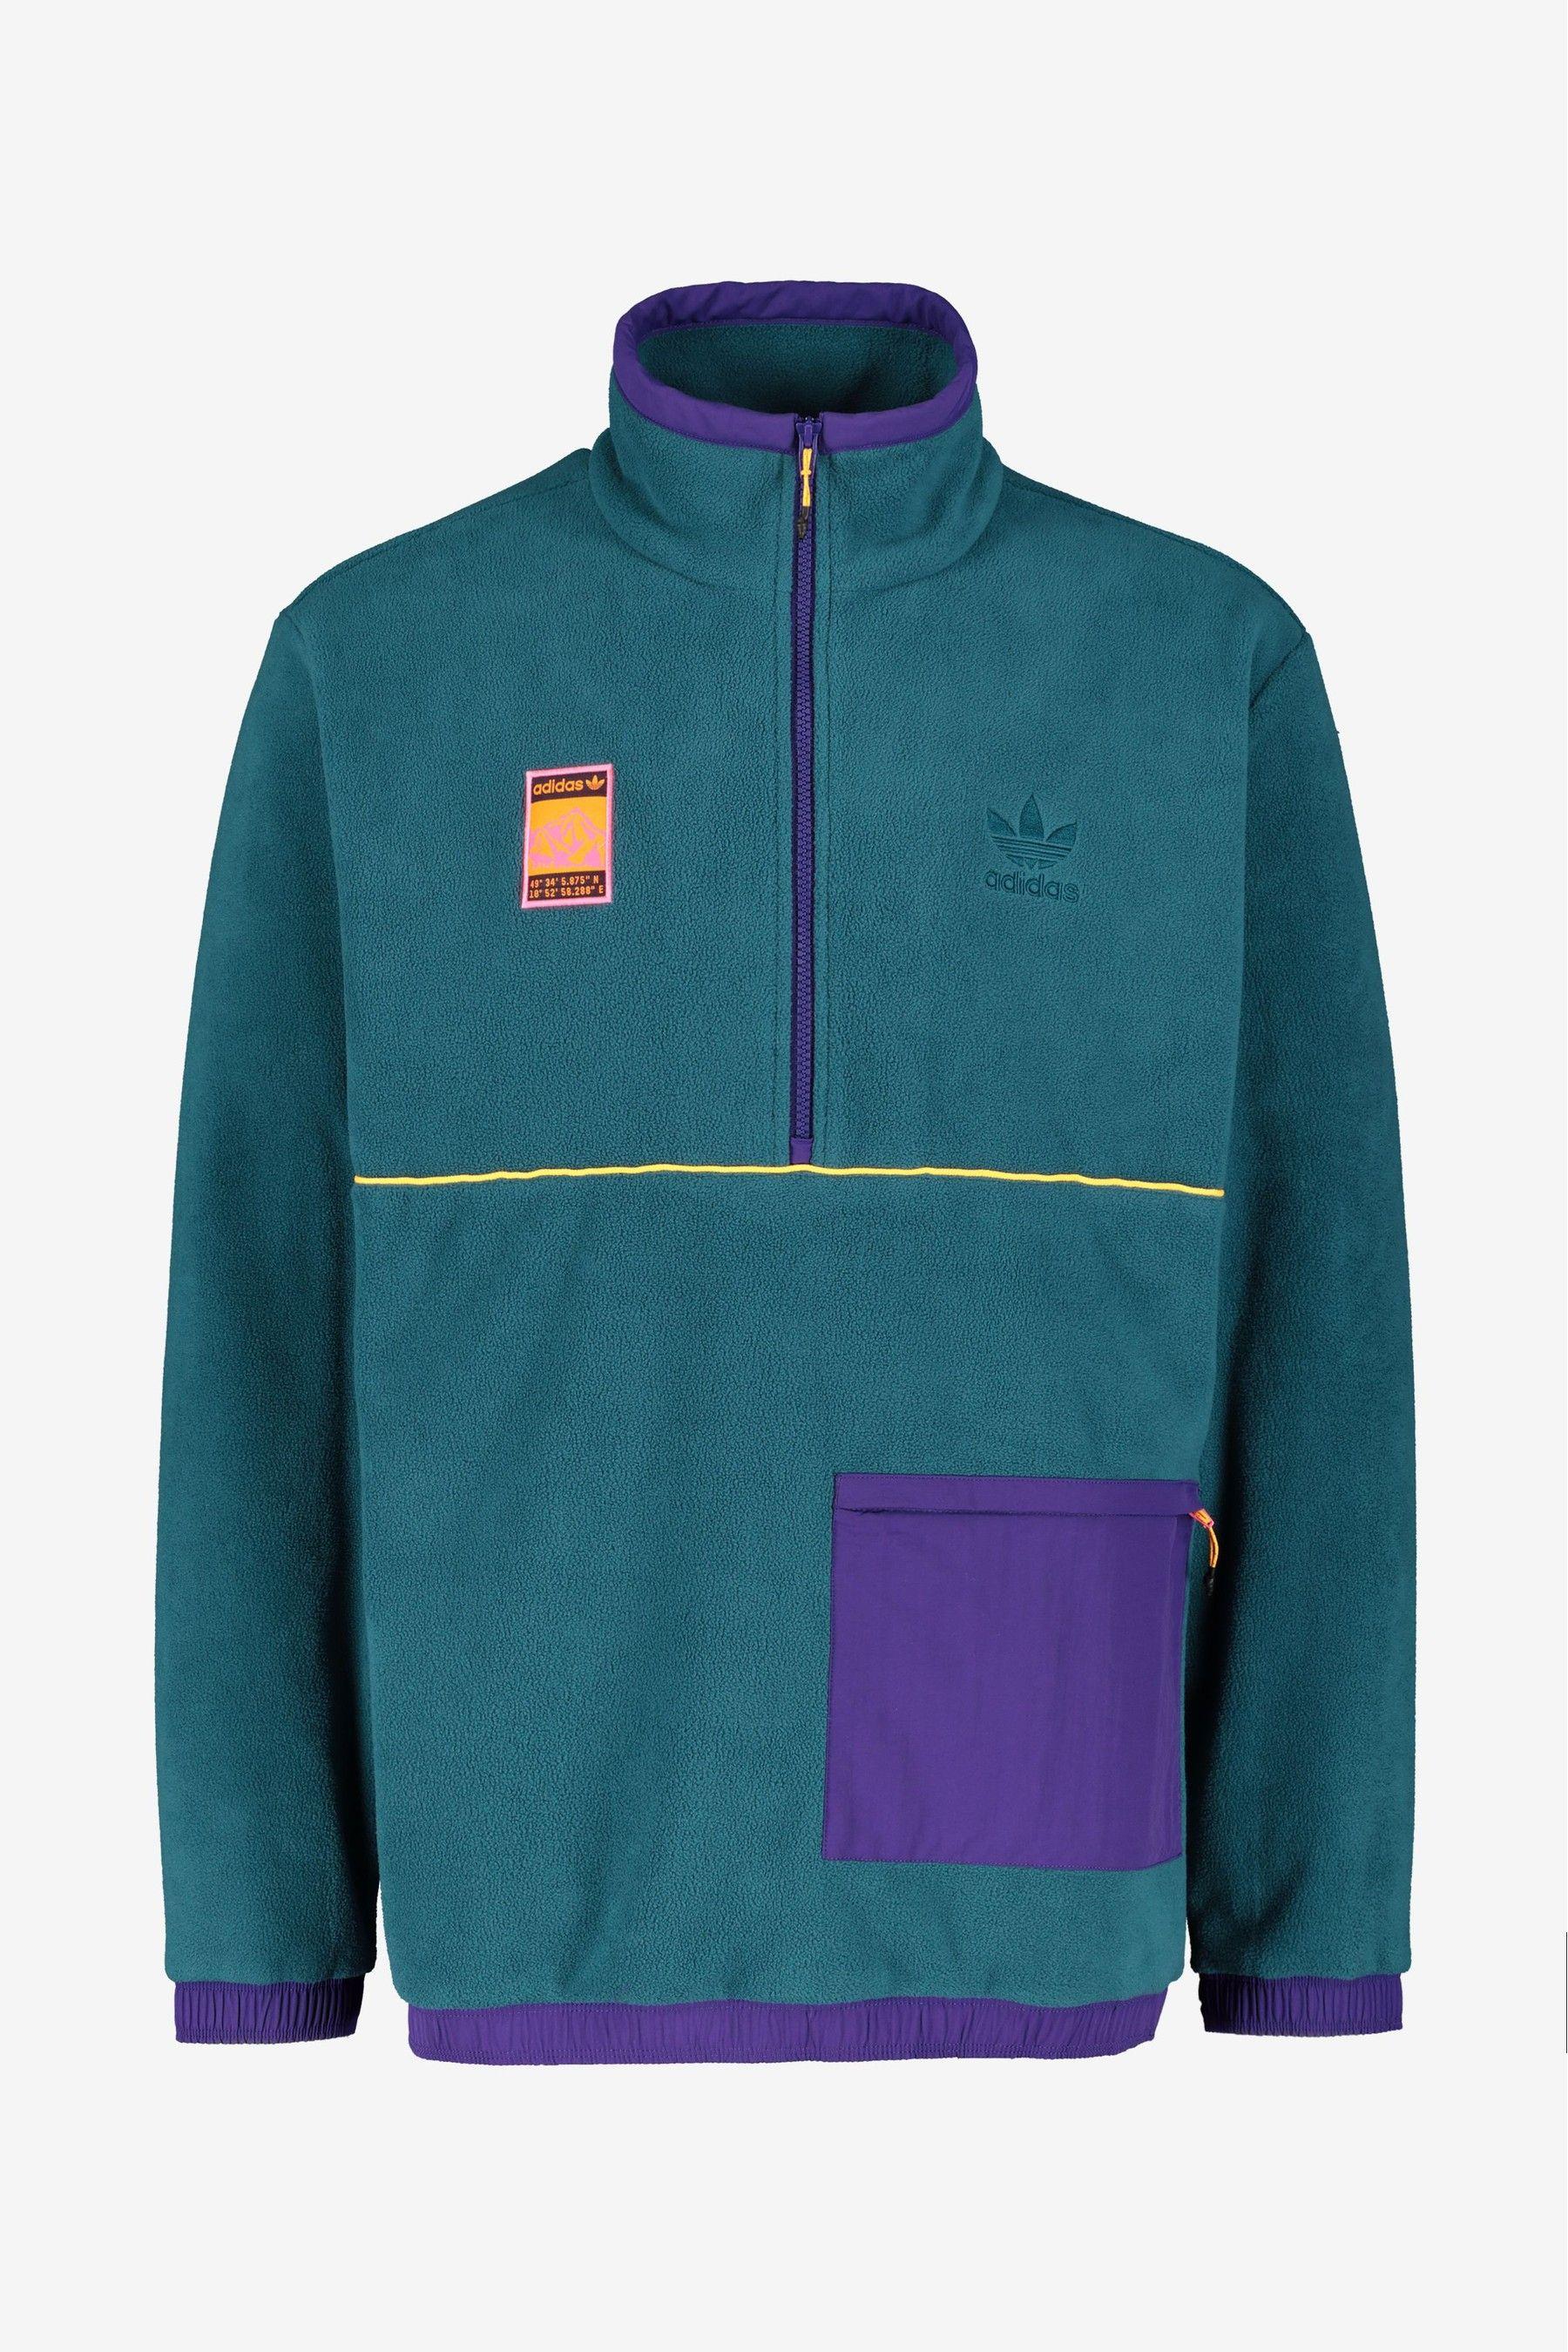 adidas Originals Sweat shirt Adiplore Polar Multi Color